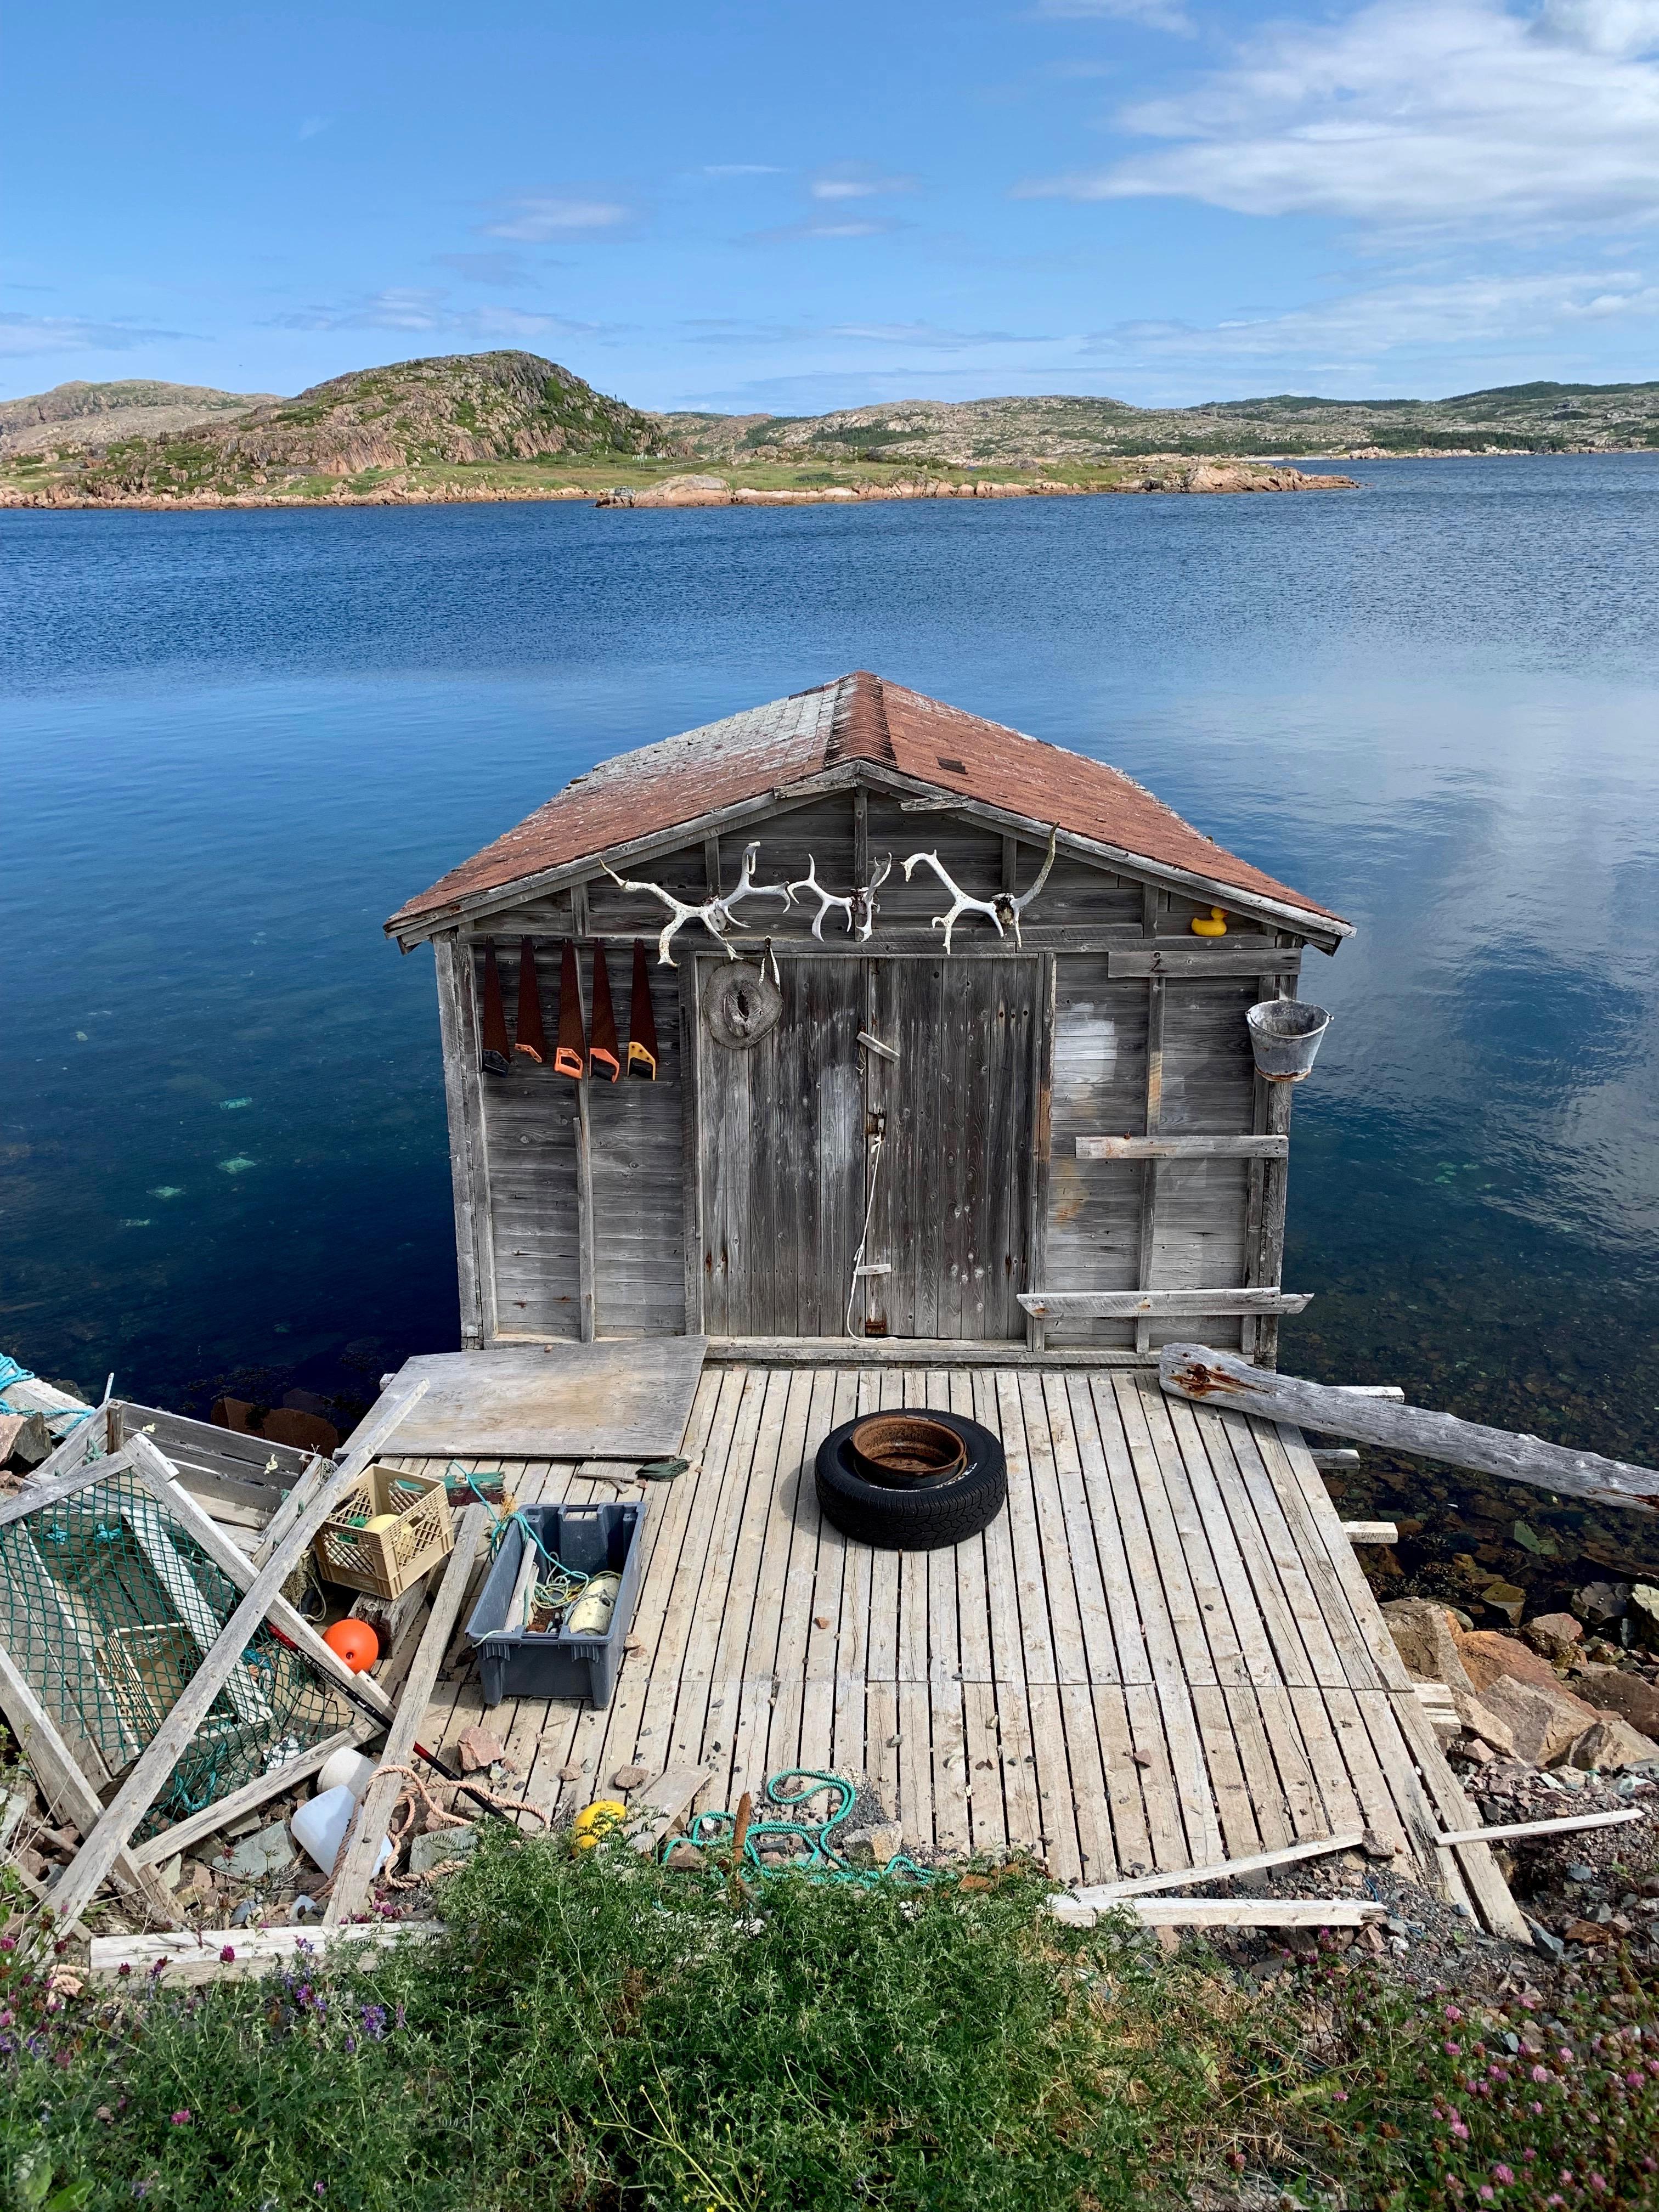 Antler Shed - Fogo Island - photo by Karen Anderson